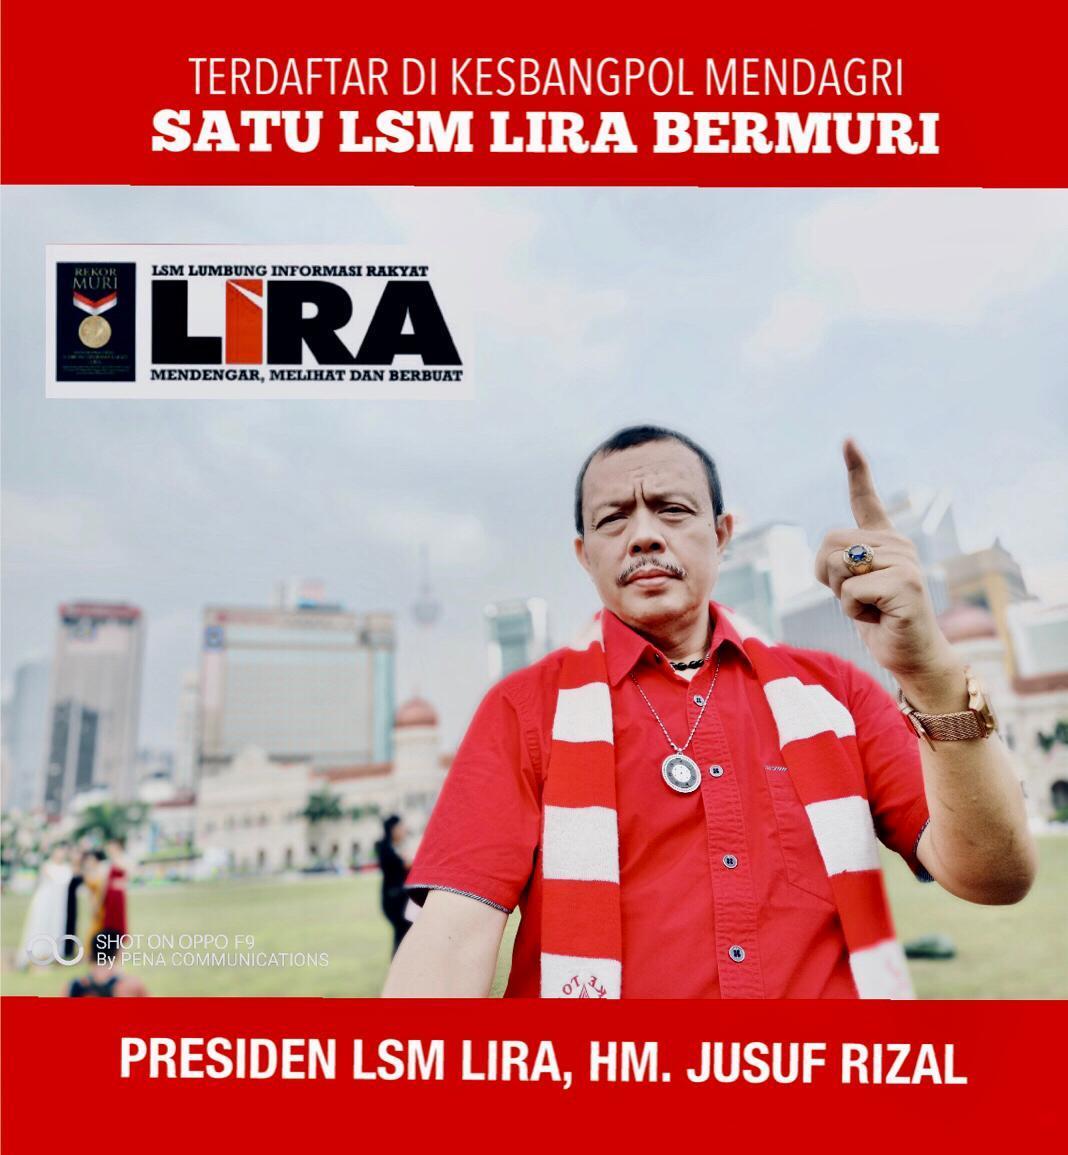 Presiden LSM LIRA: Dugaan Fee Proyek 7.5 Persen Hasil Pansus DPRD Sulsel Perlu Dilaporkan KPK